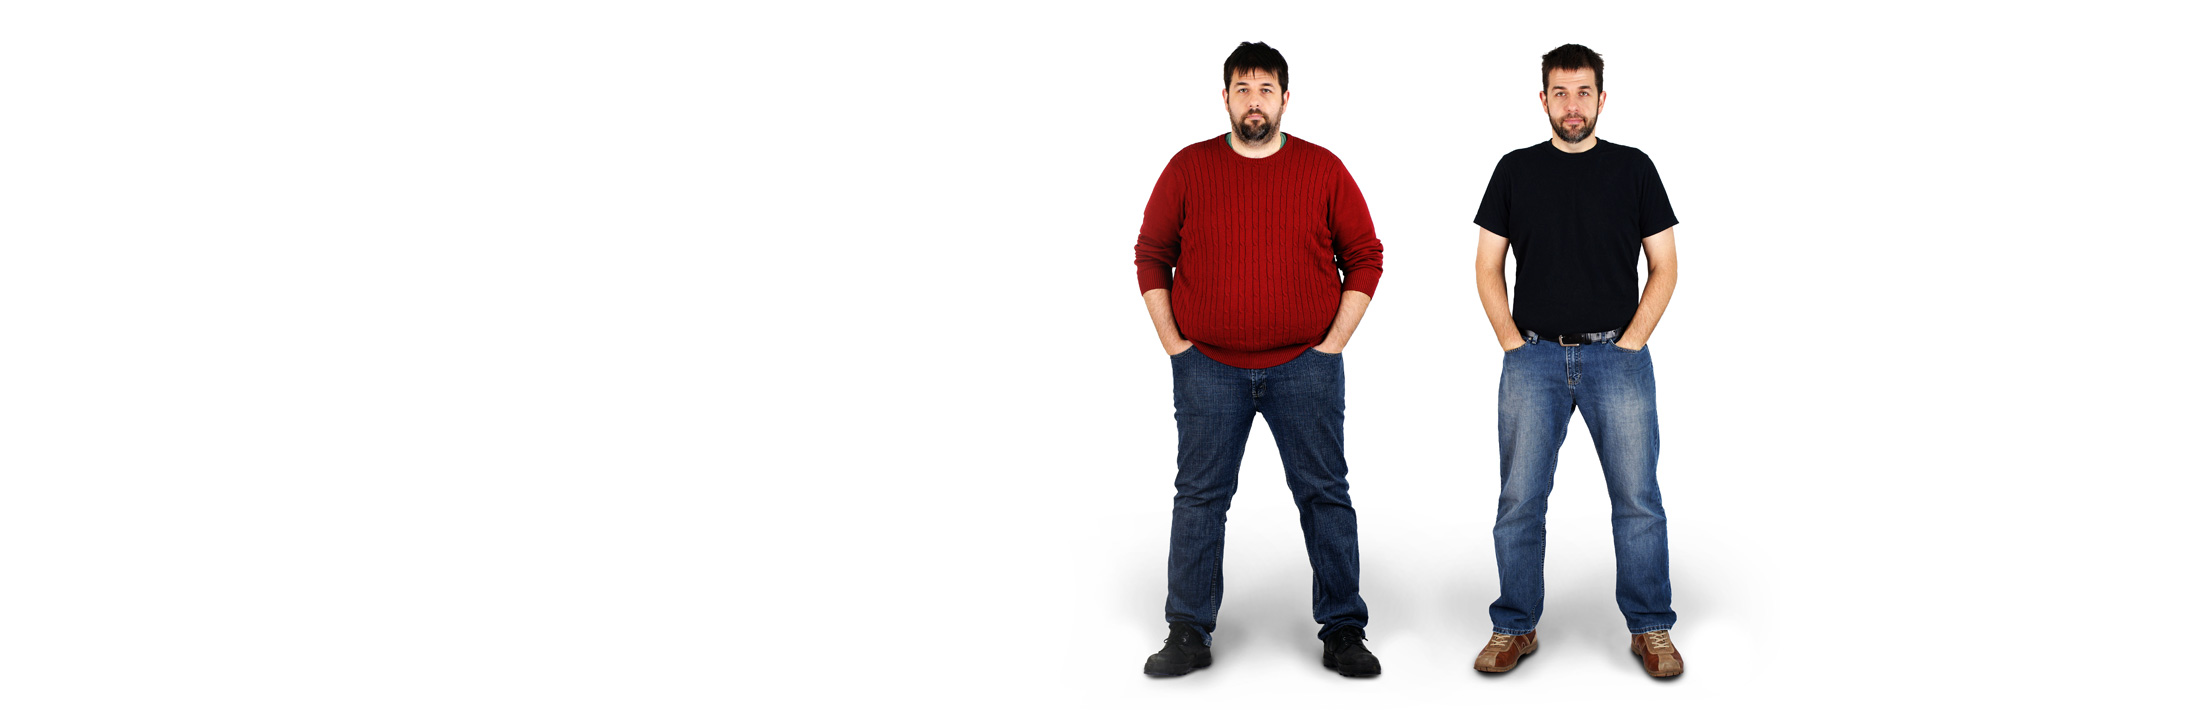 Weight Loss Latvia